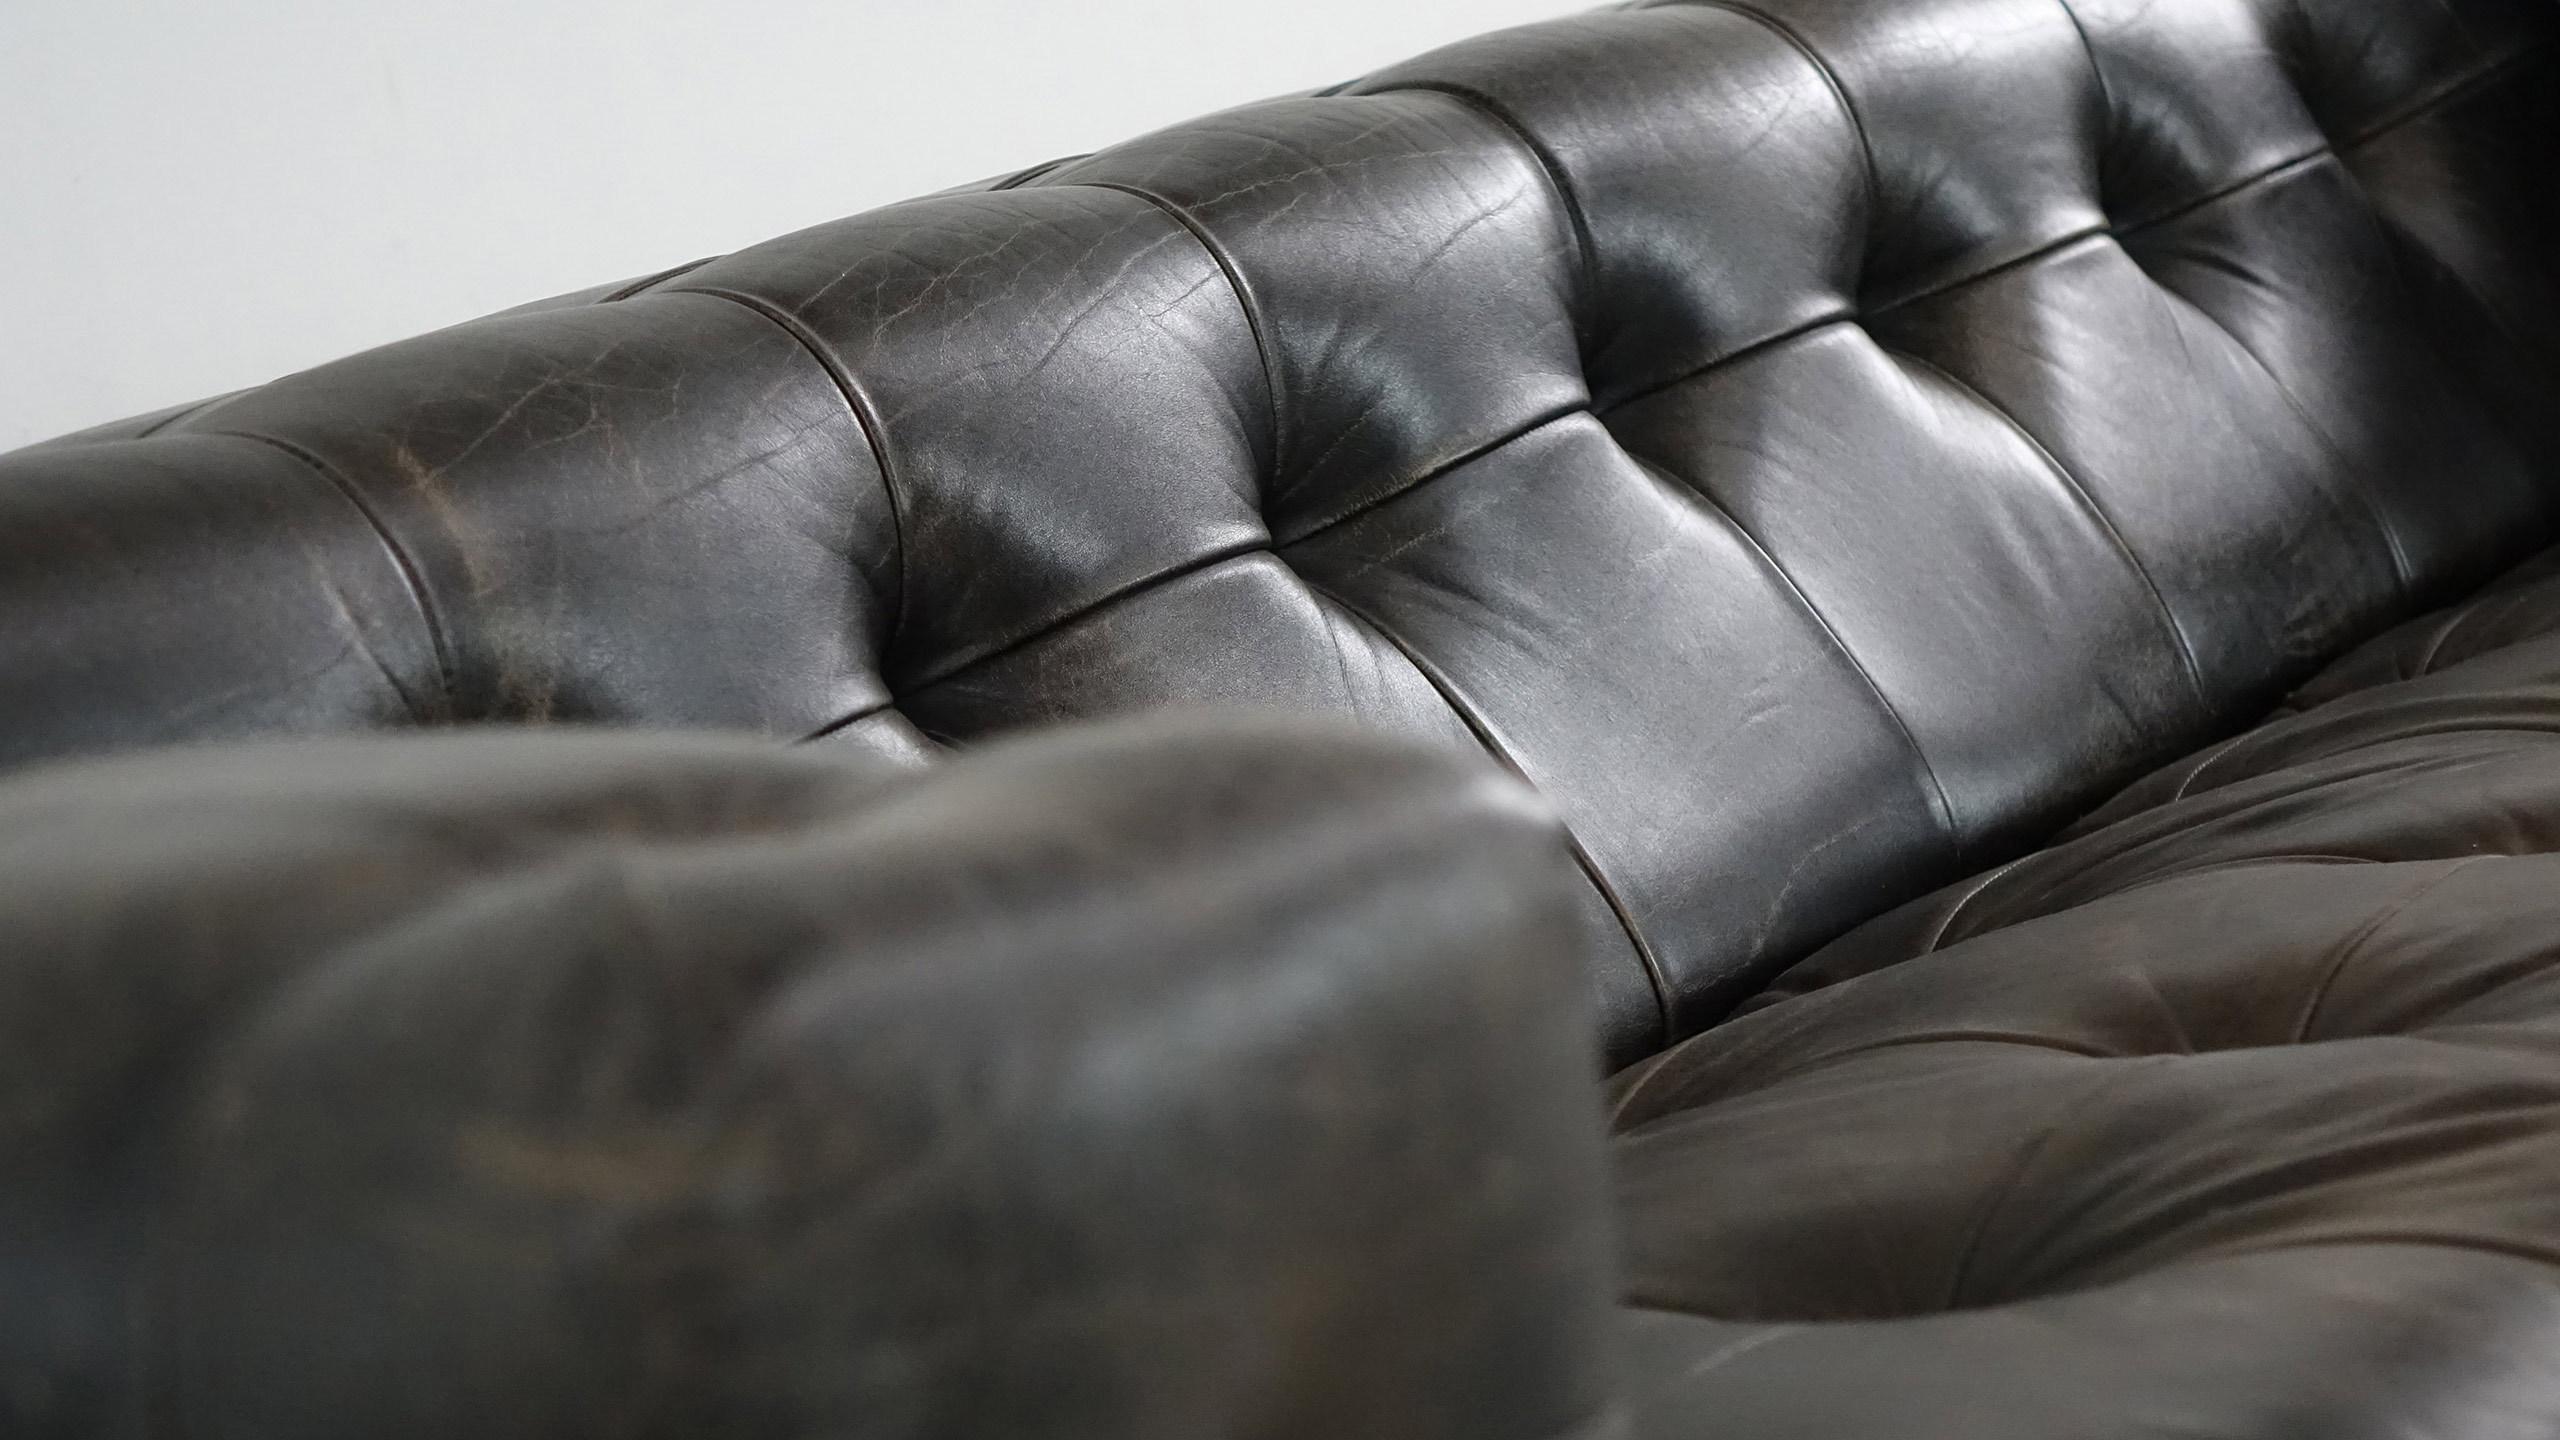 Full Size of De Sede Sofa Endless Ds 600 Bi Preis Uk Leder Gebraucht Sessel Kaufen Furniture Used For Sale By Robert Haussmann Rh 306 Club Swiss Design Badezimmer Sofa De Sede Sofa